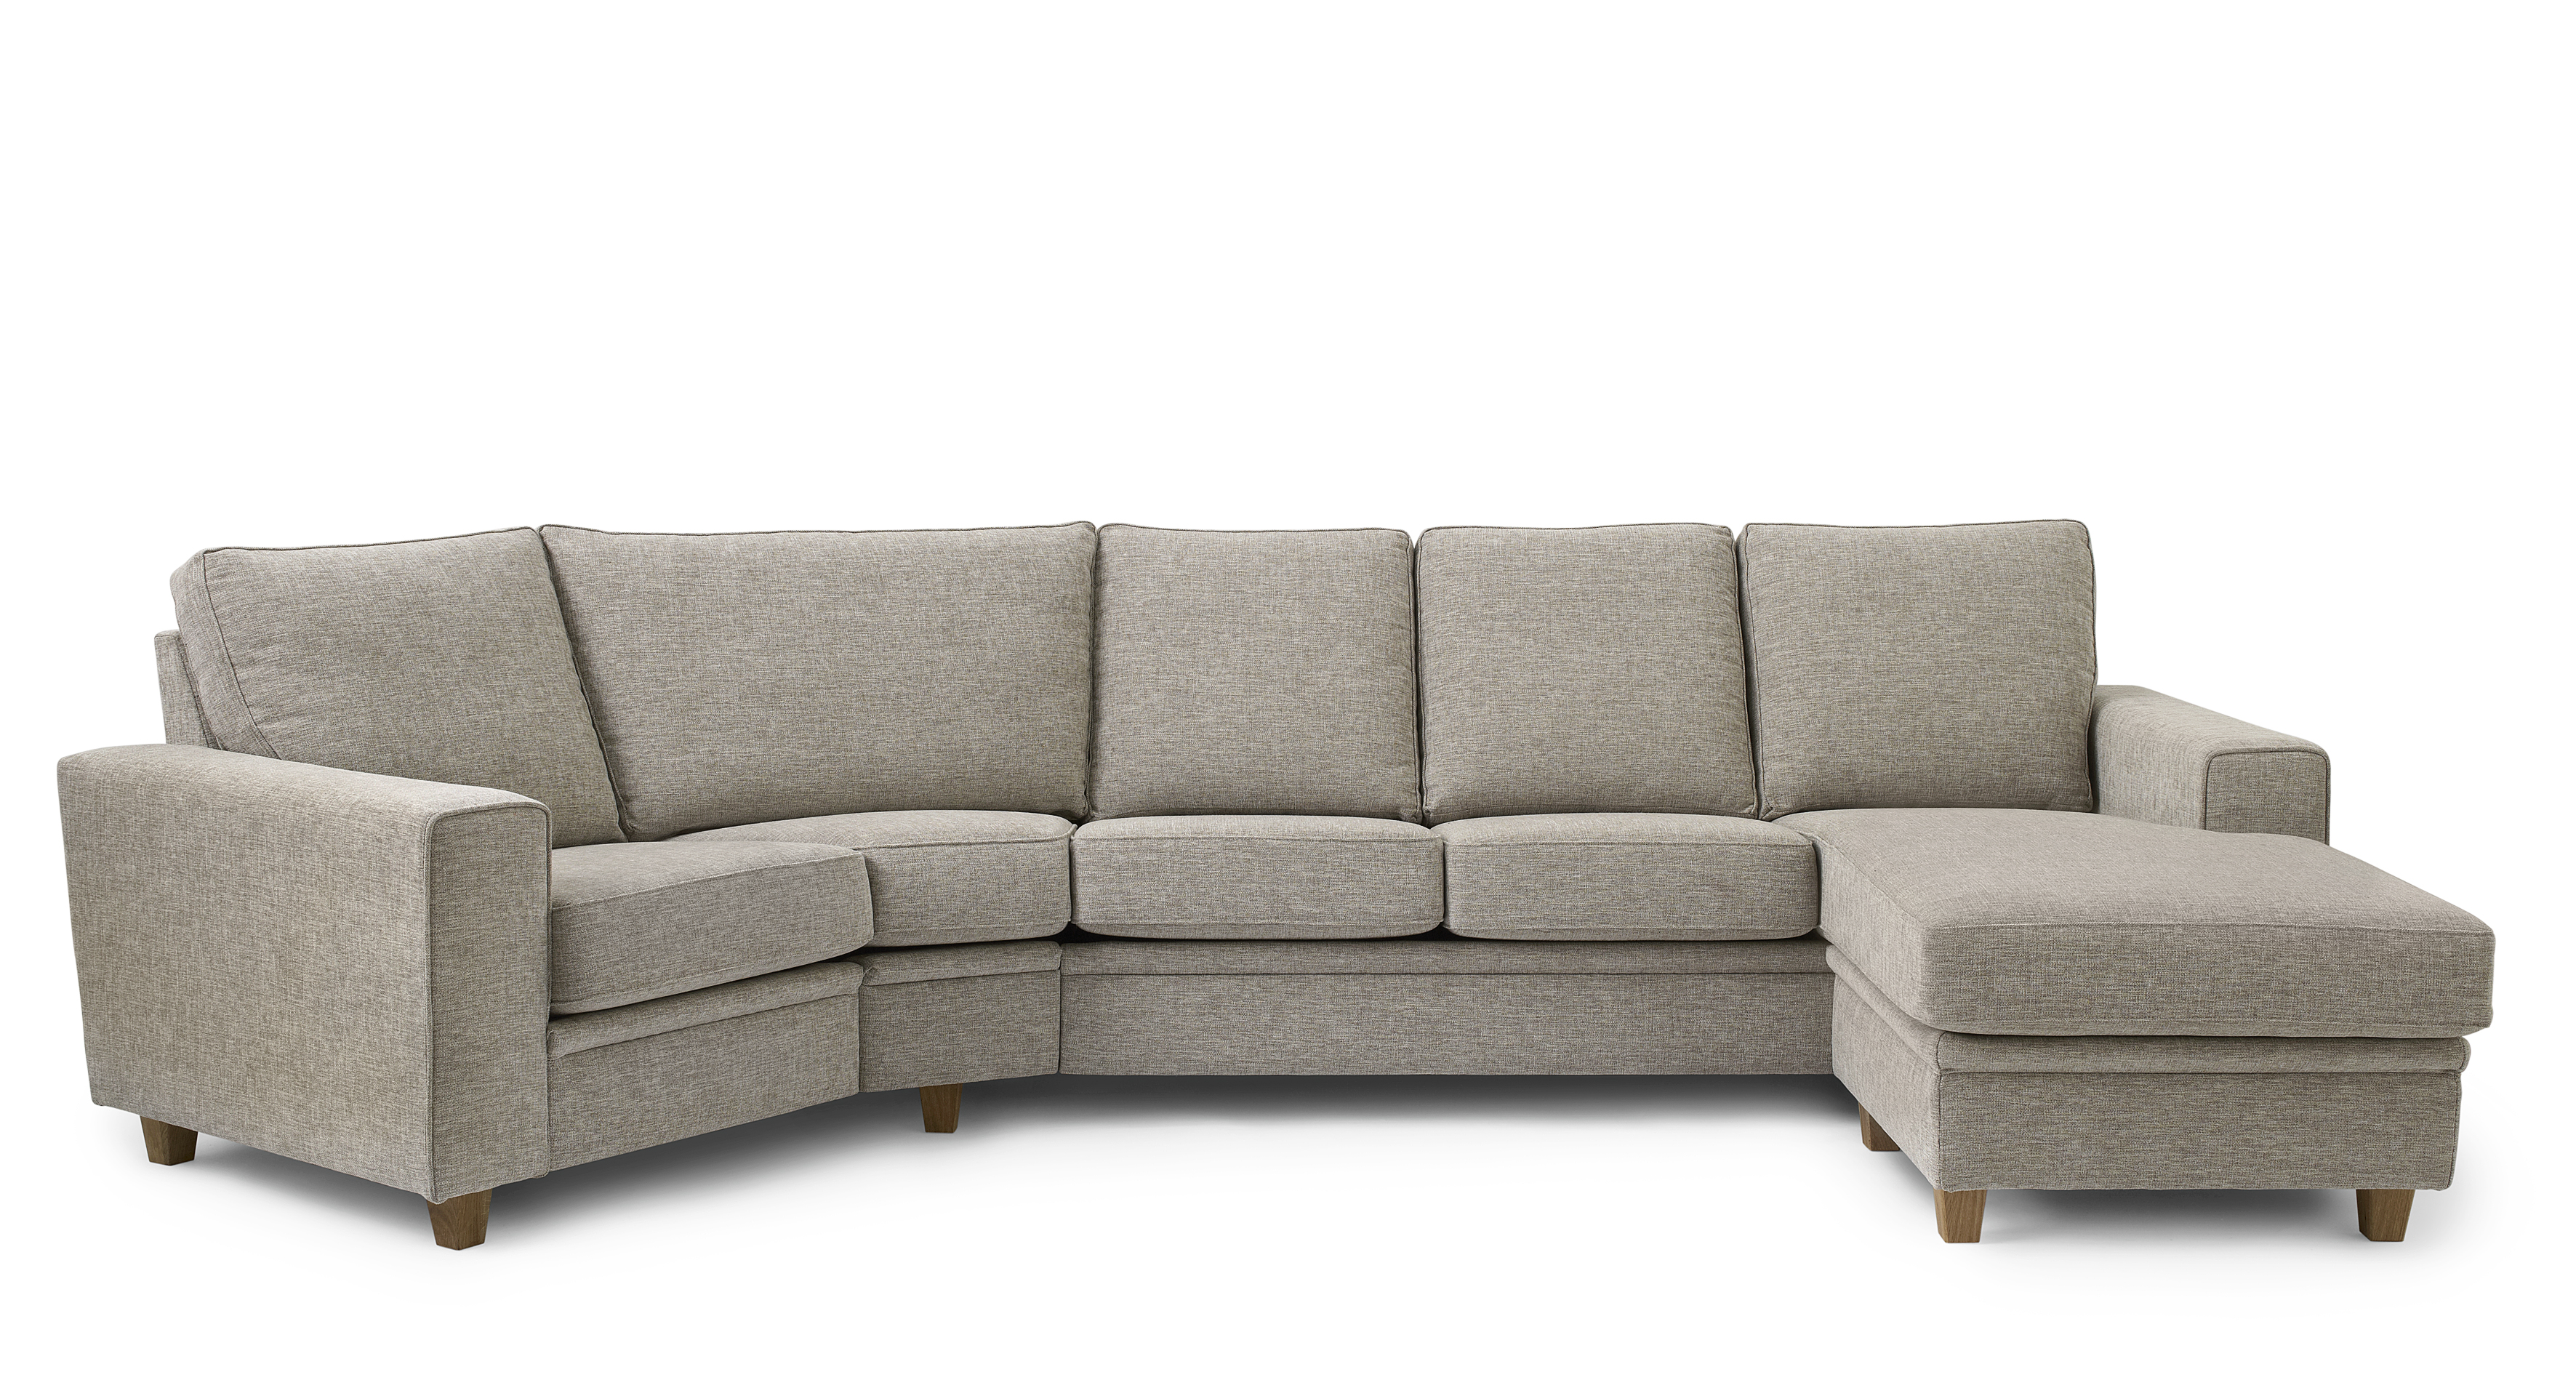 Möbelform Pluz byggbar soffa tyg